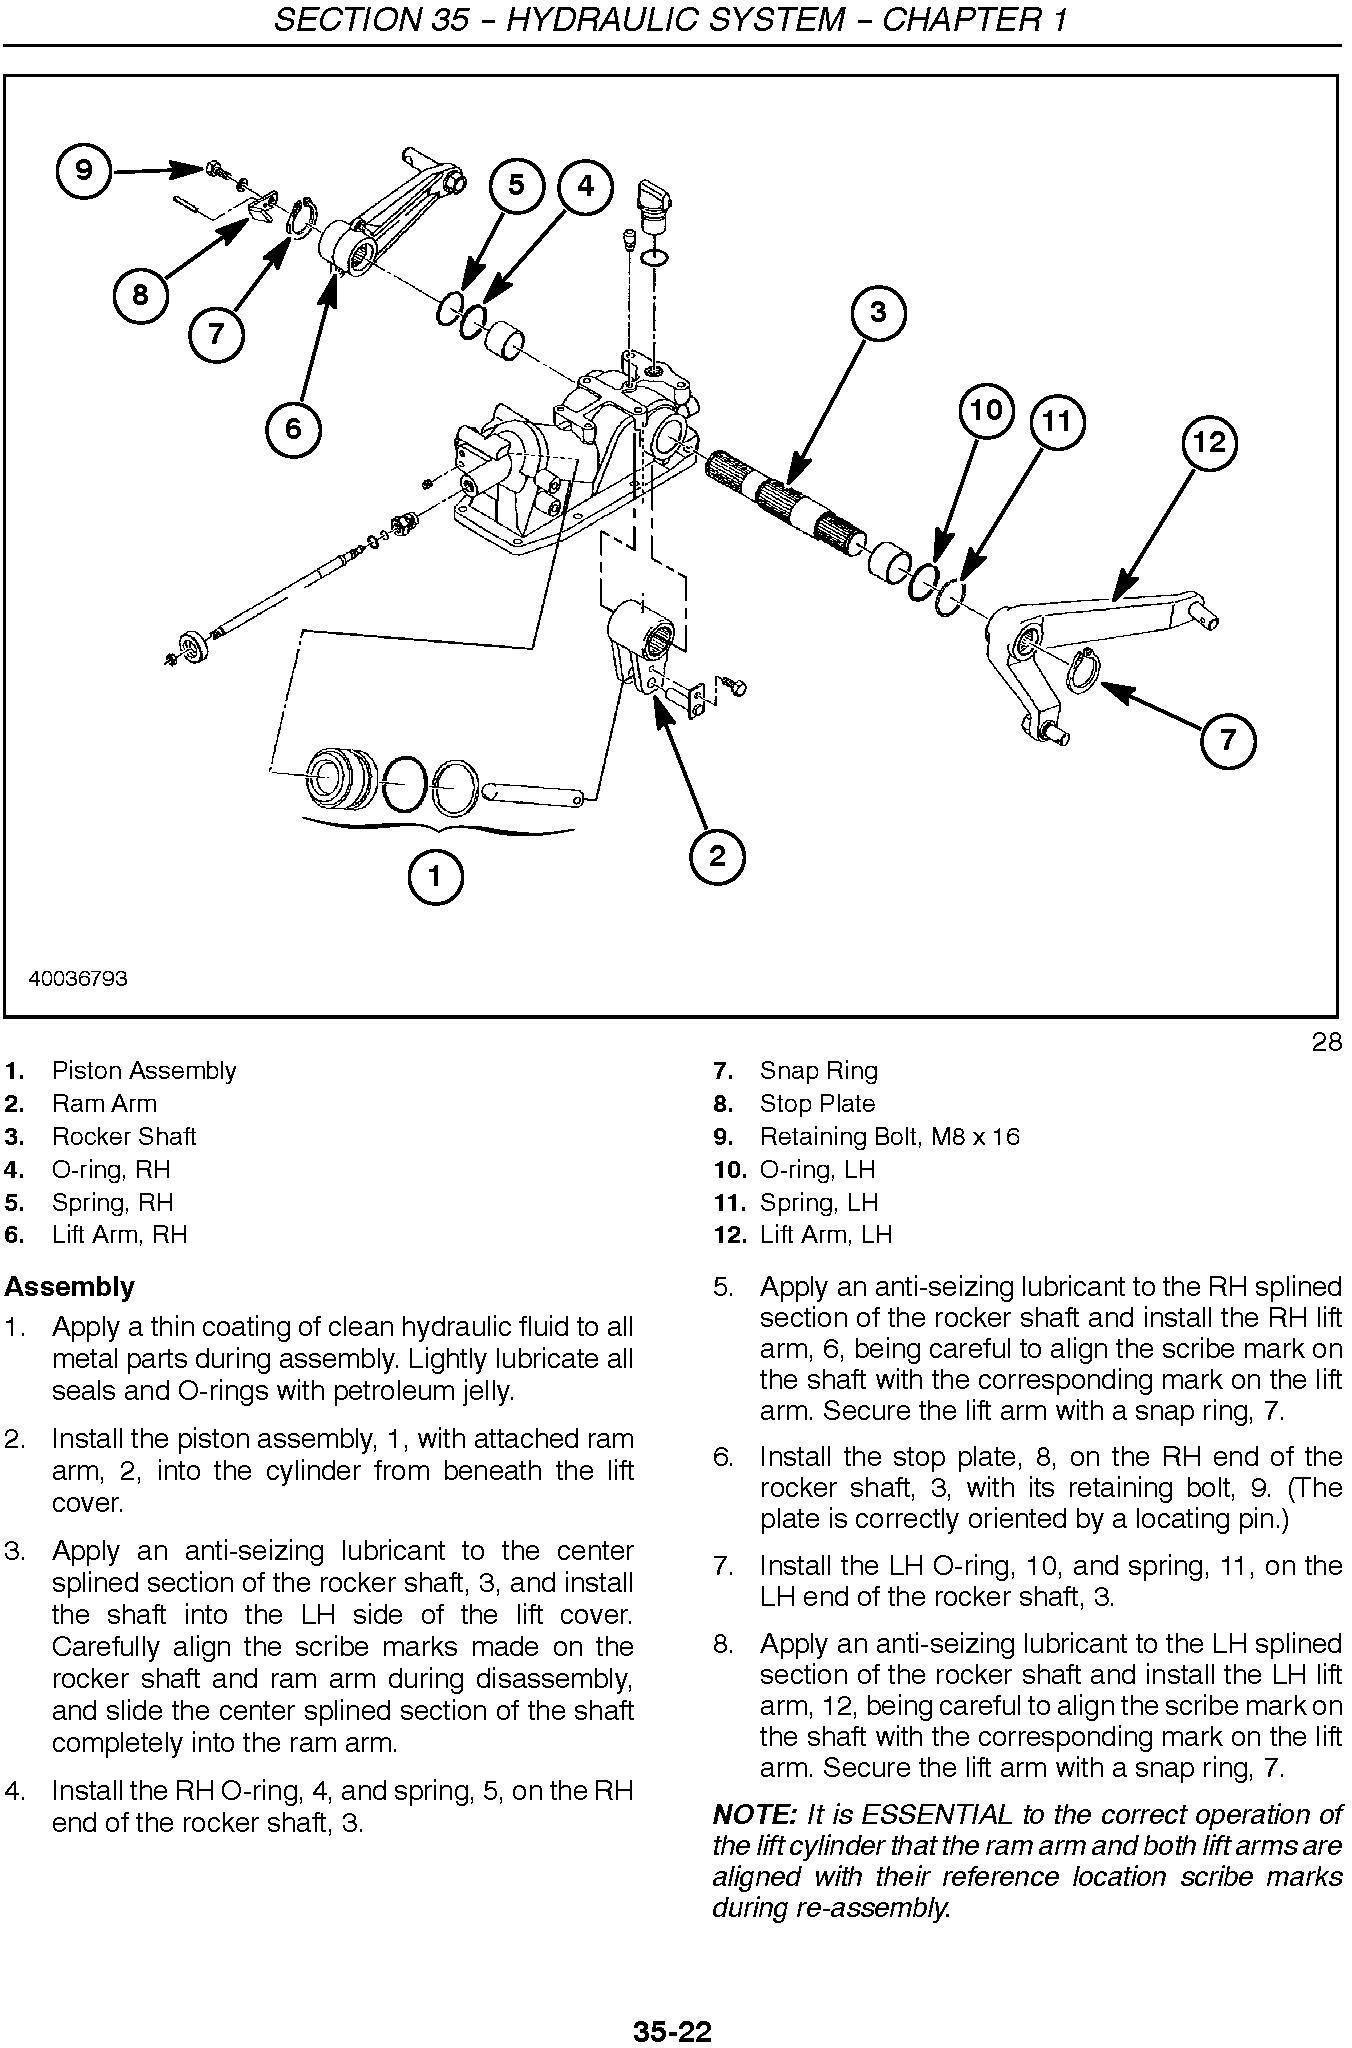 New Holland TZ18DA, TZ22DA, TZ24DA, TZ25DA Compact Tractor Complete Service Manual - 3